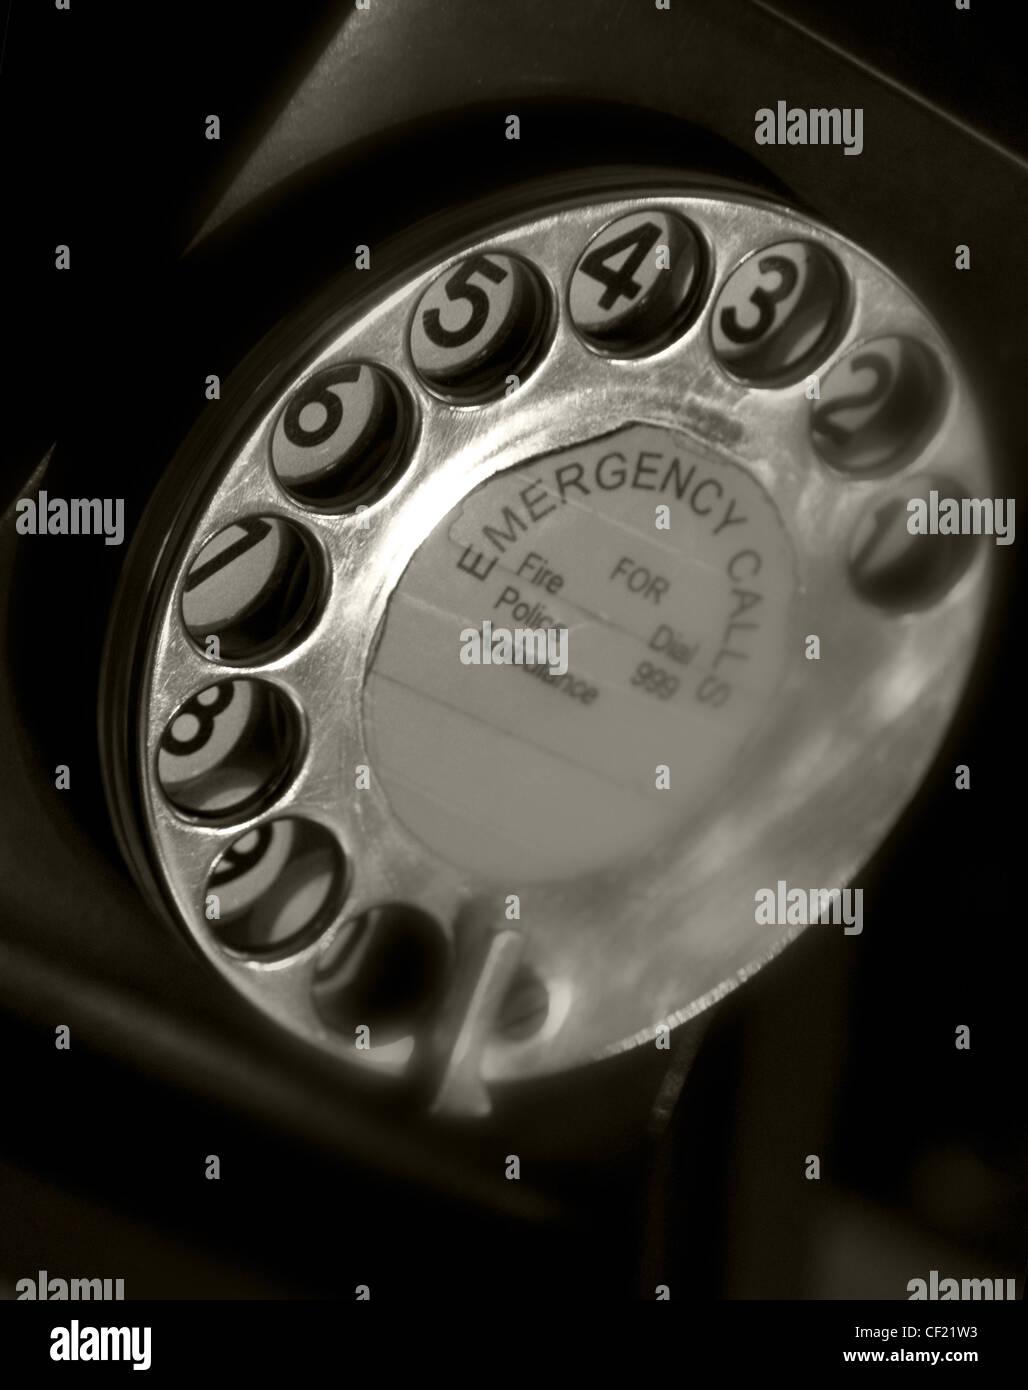 Black Telephone dial Emergency Call - 999 - Stock Image